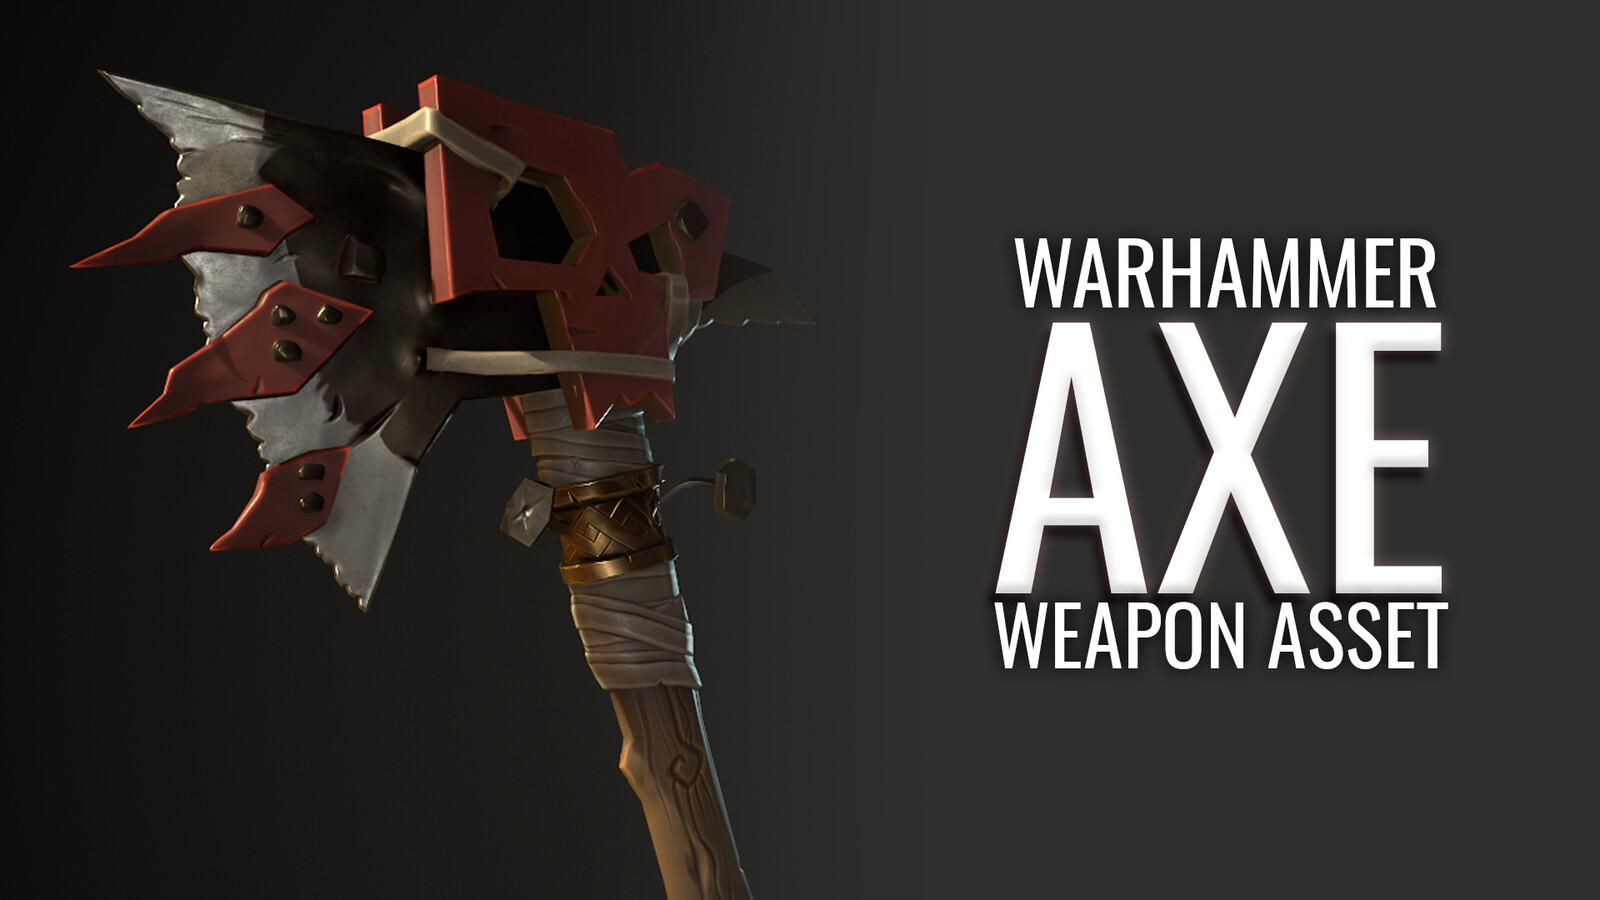 Warhammer - Axe